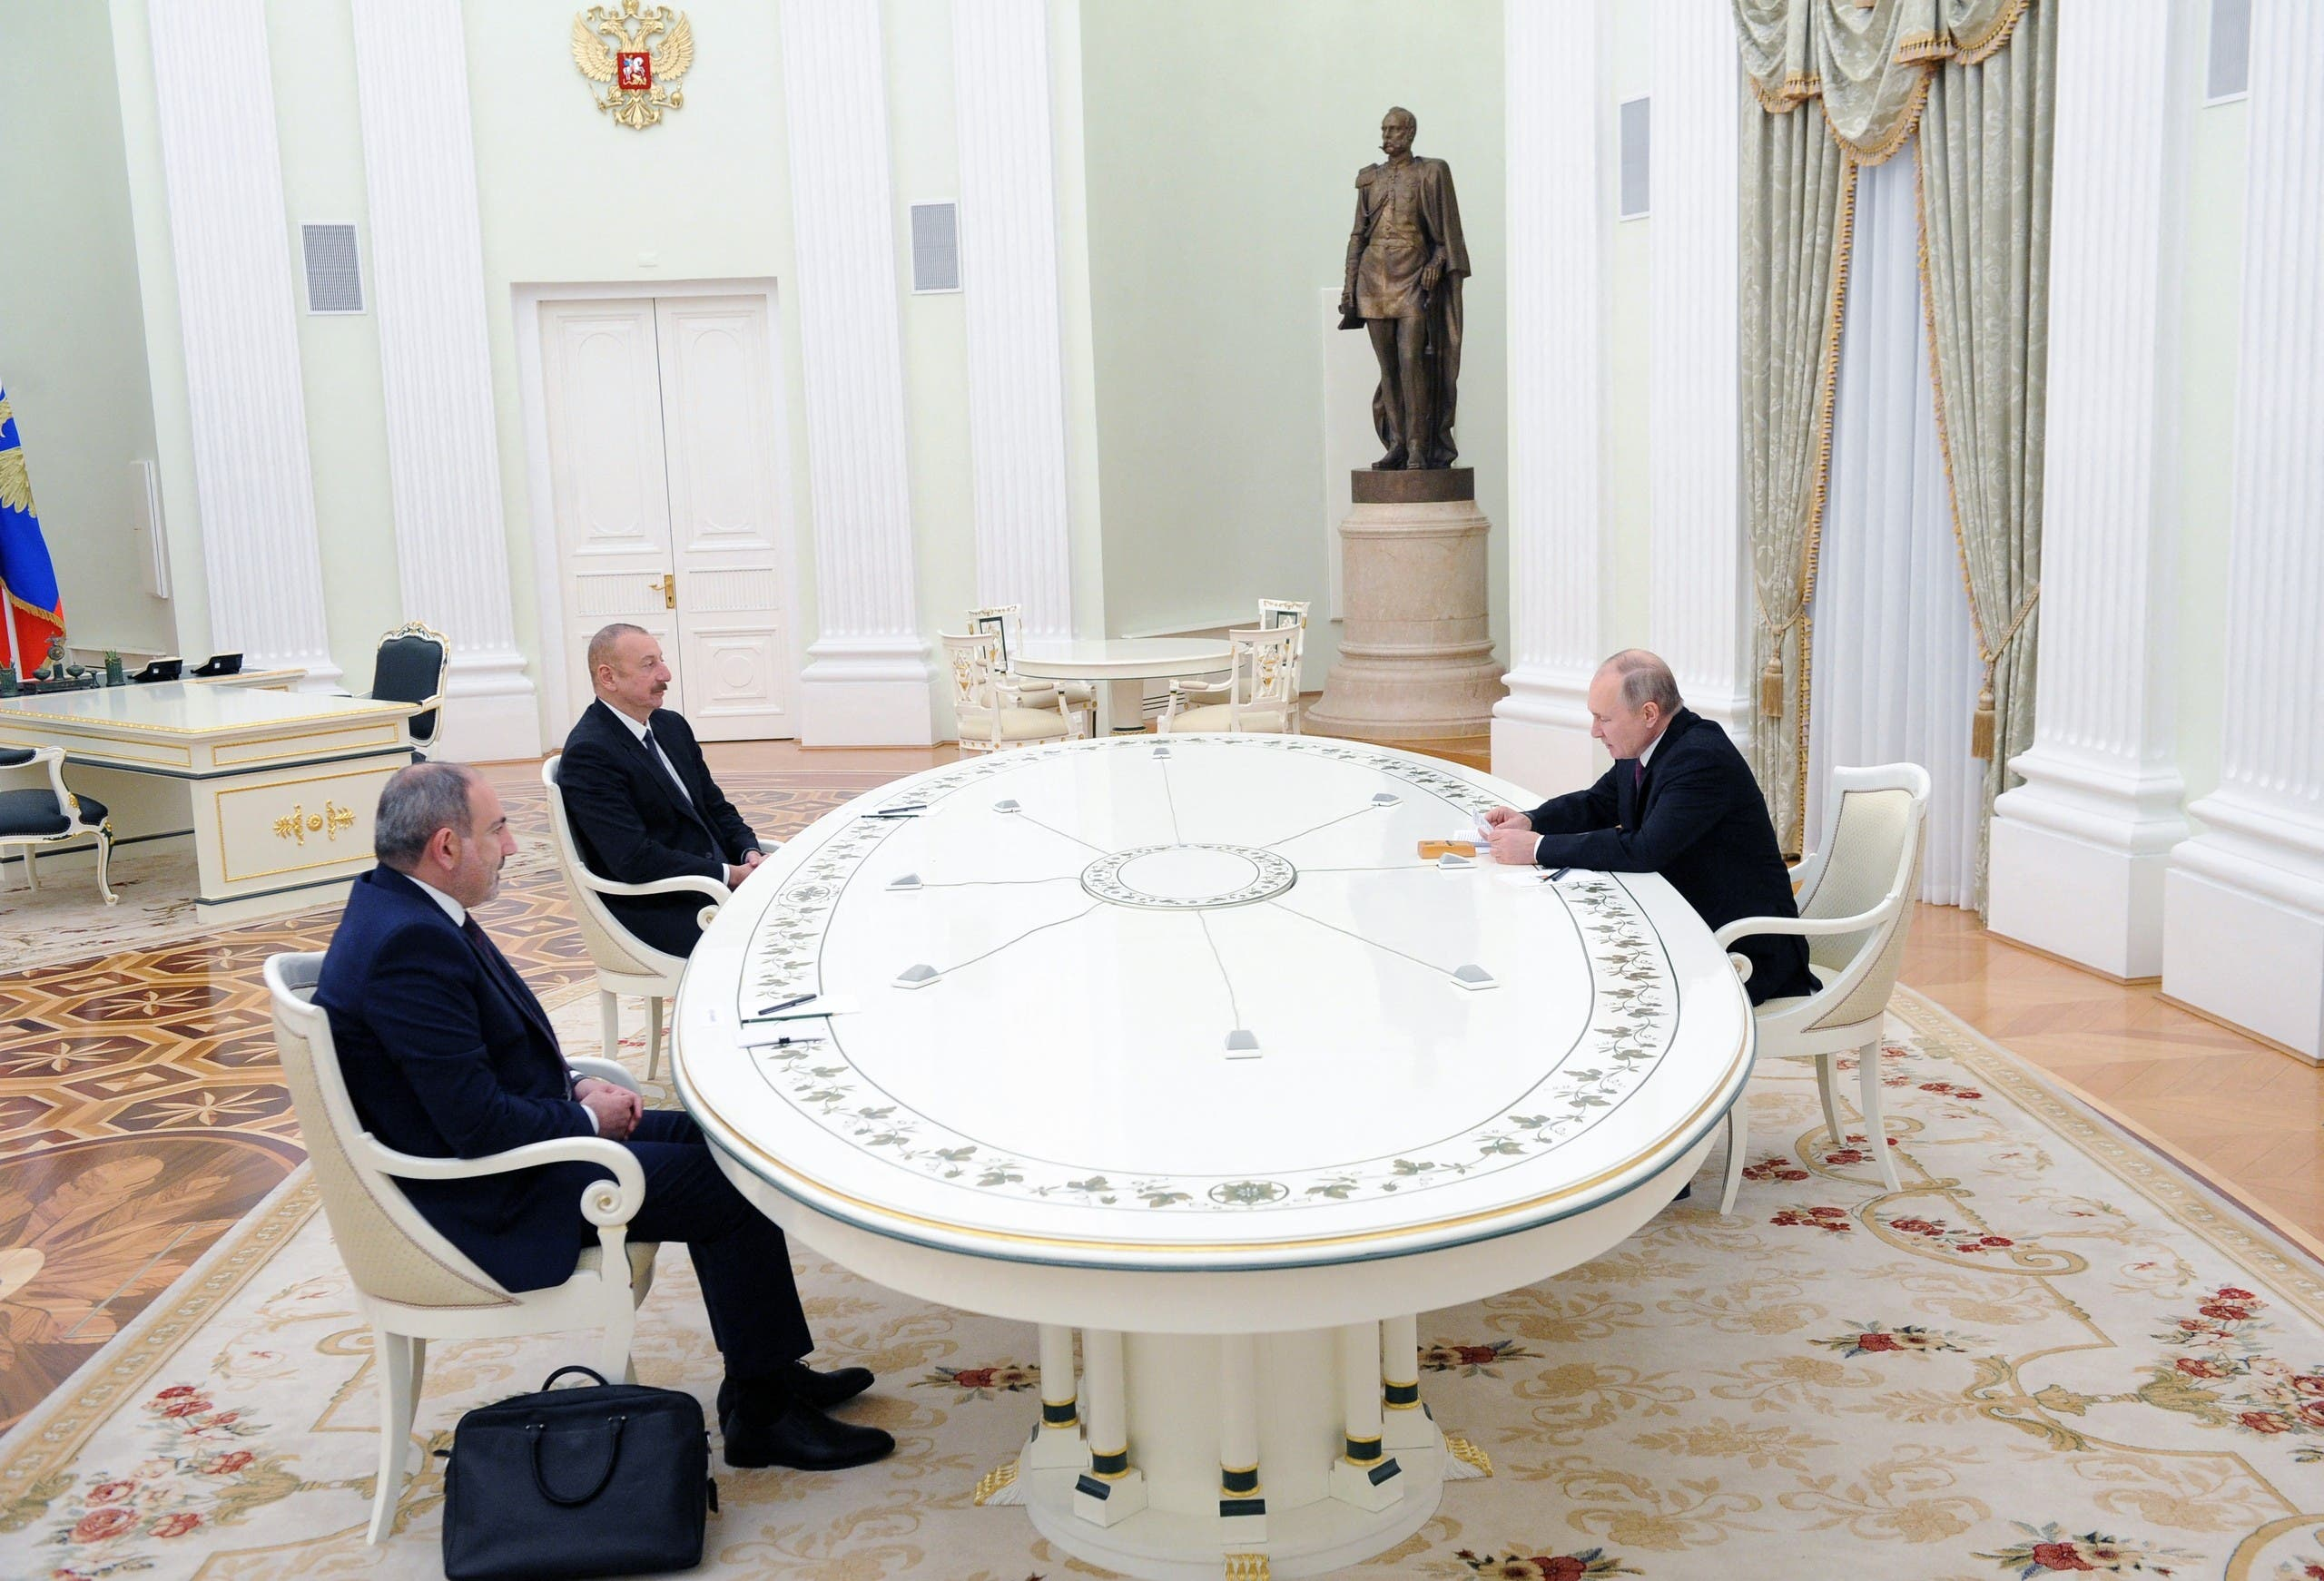 Russian President Vladimir Putin (R) meets Armenian PM Nikol Pashinyan (L) and Azerbaijani President Ilham Aliyev over Nagorno-Karabakh, in Moscow, Jan. 11, 2021. (Reuters)